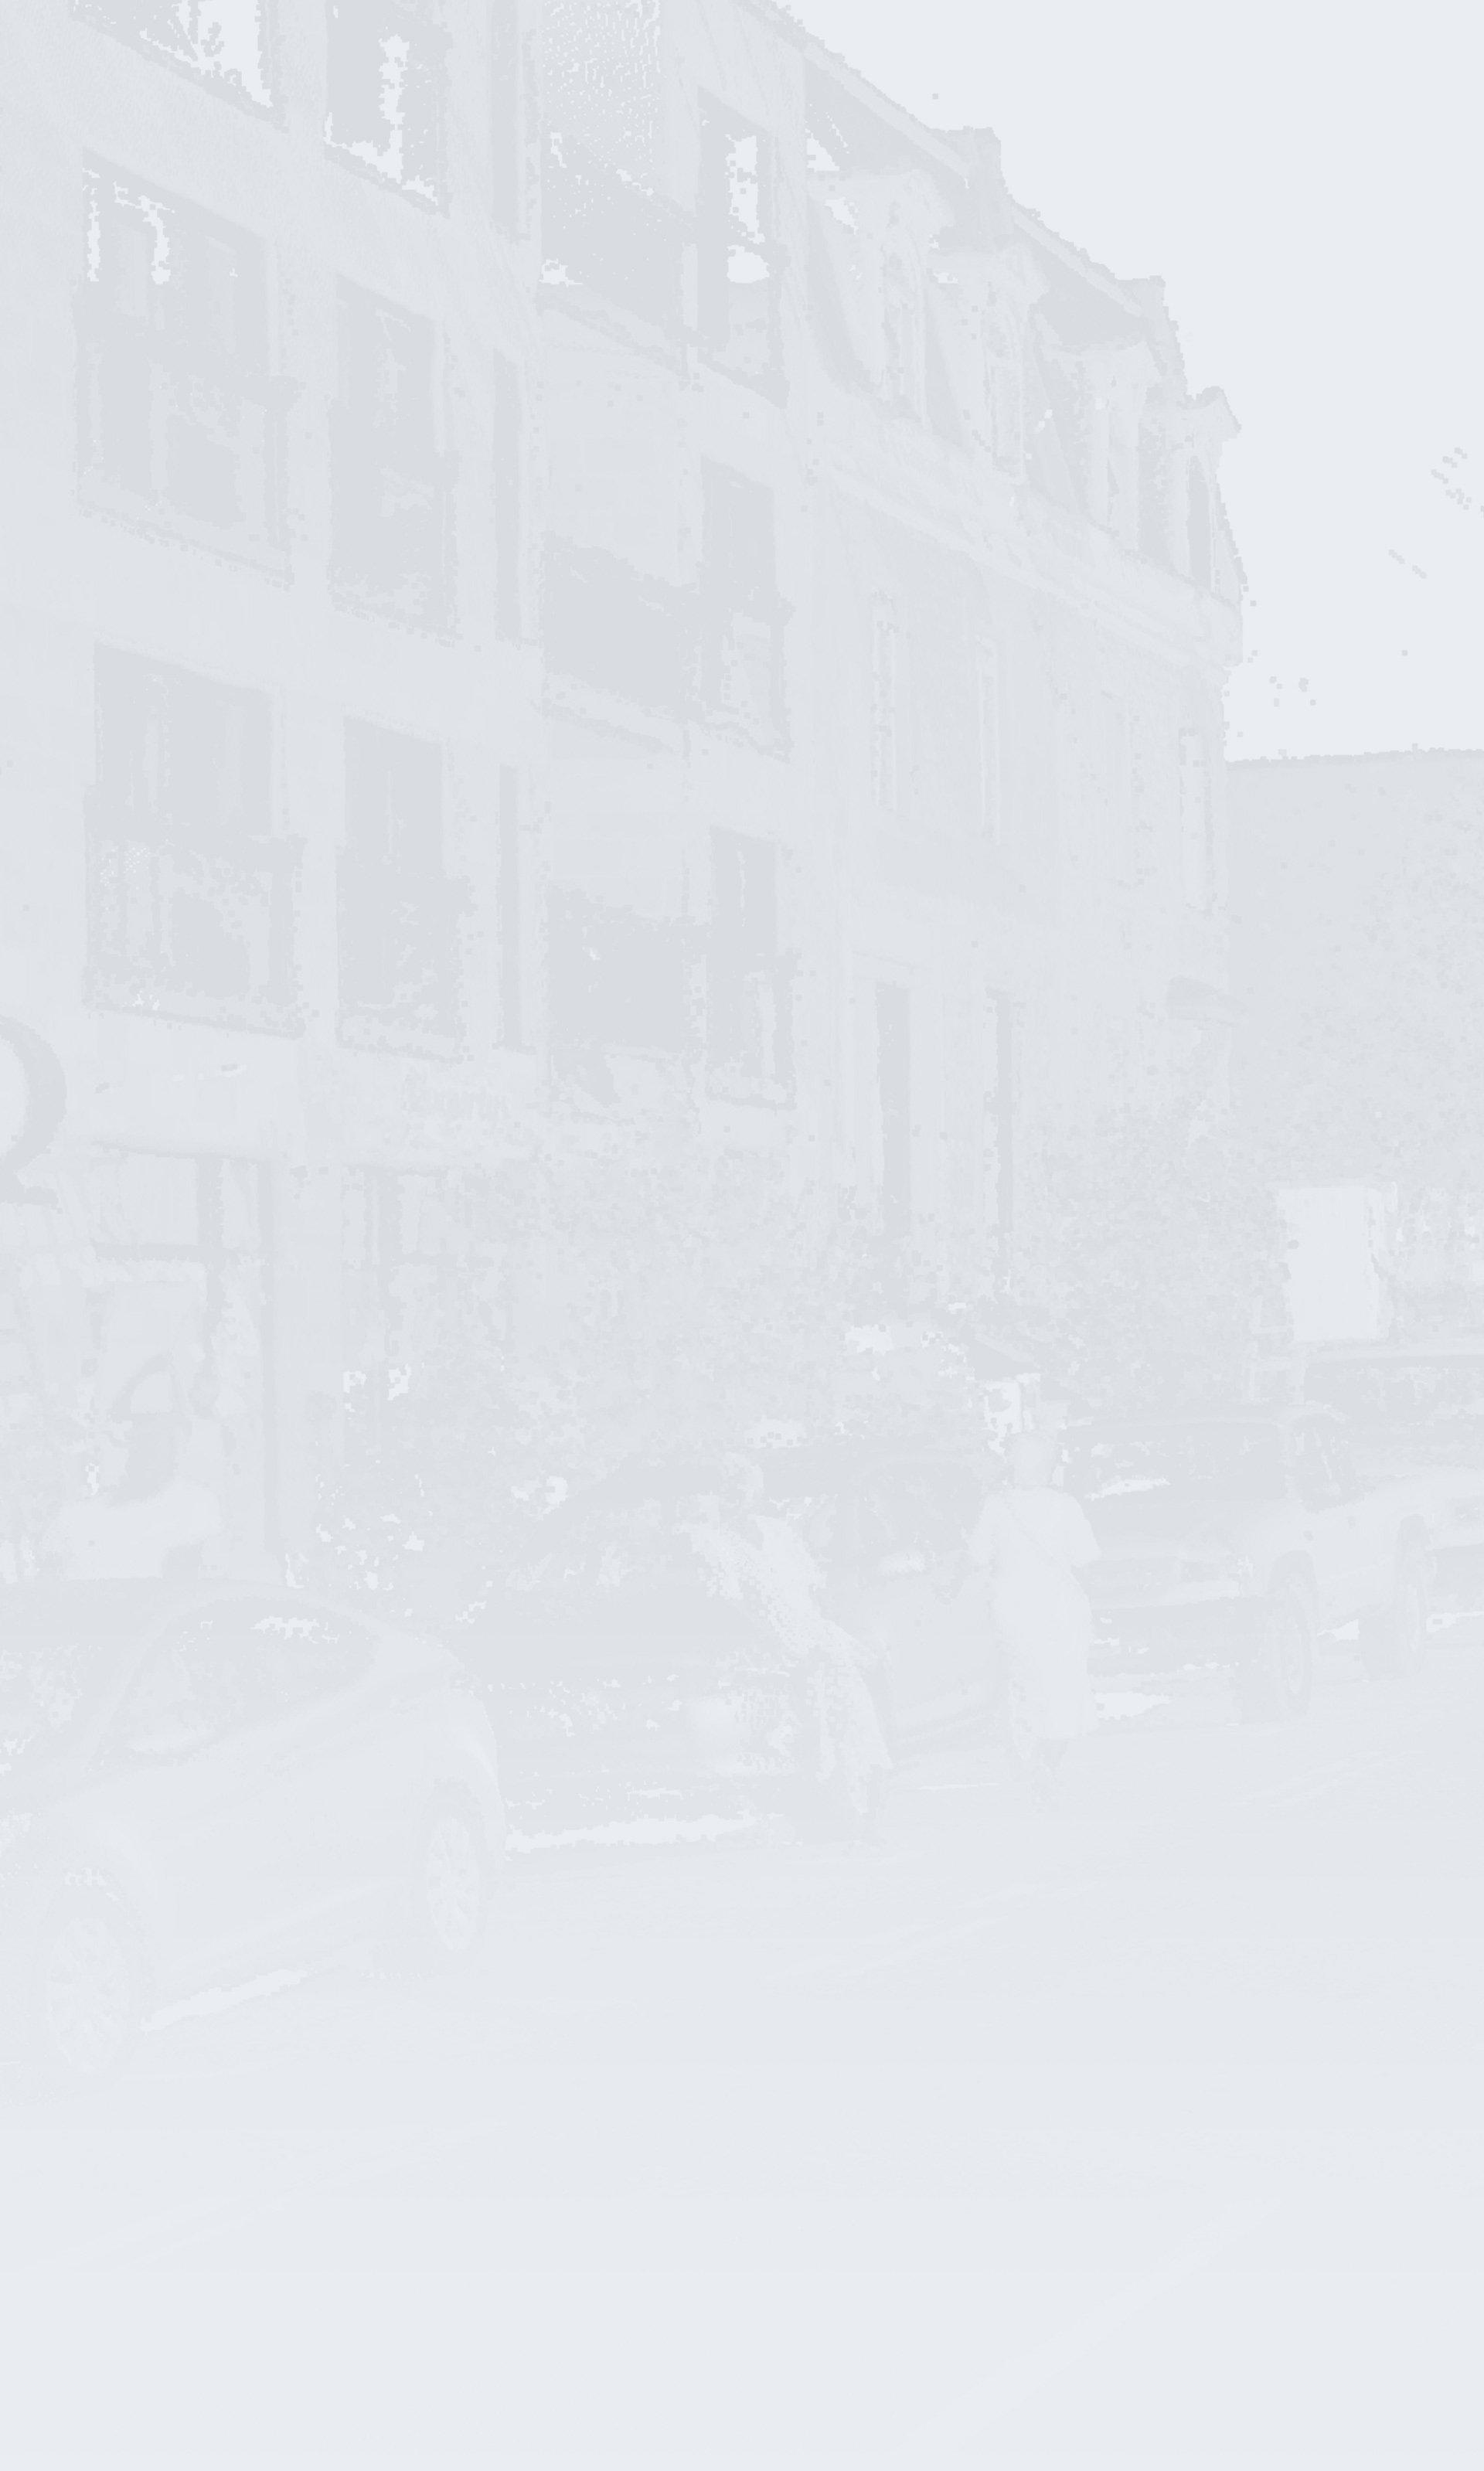 Jakarto_Self-driving_HDMap_Background_V01